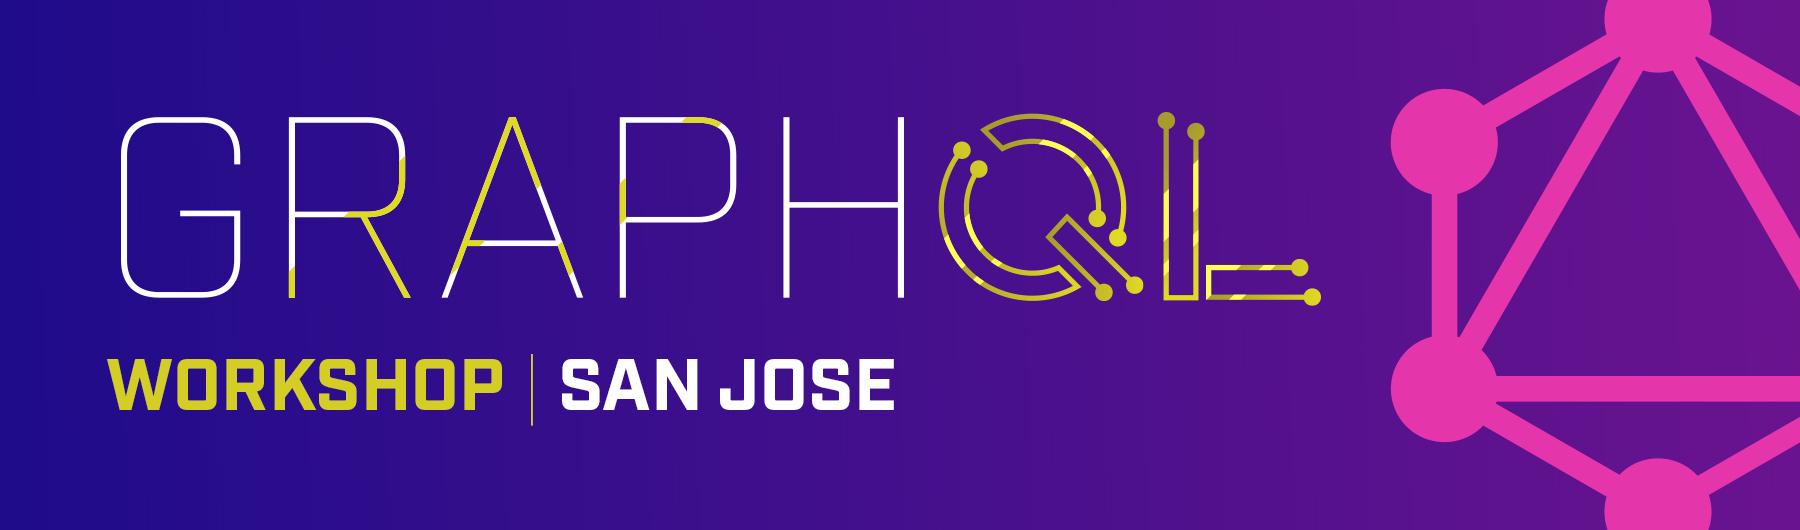 GraphQL Workshop in San Jose